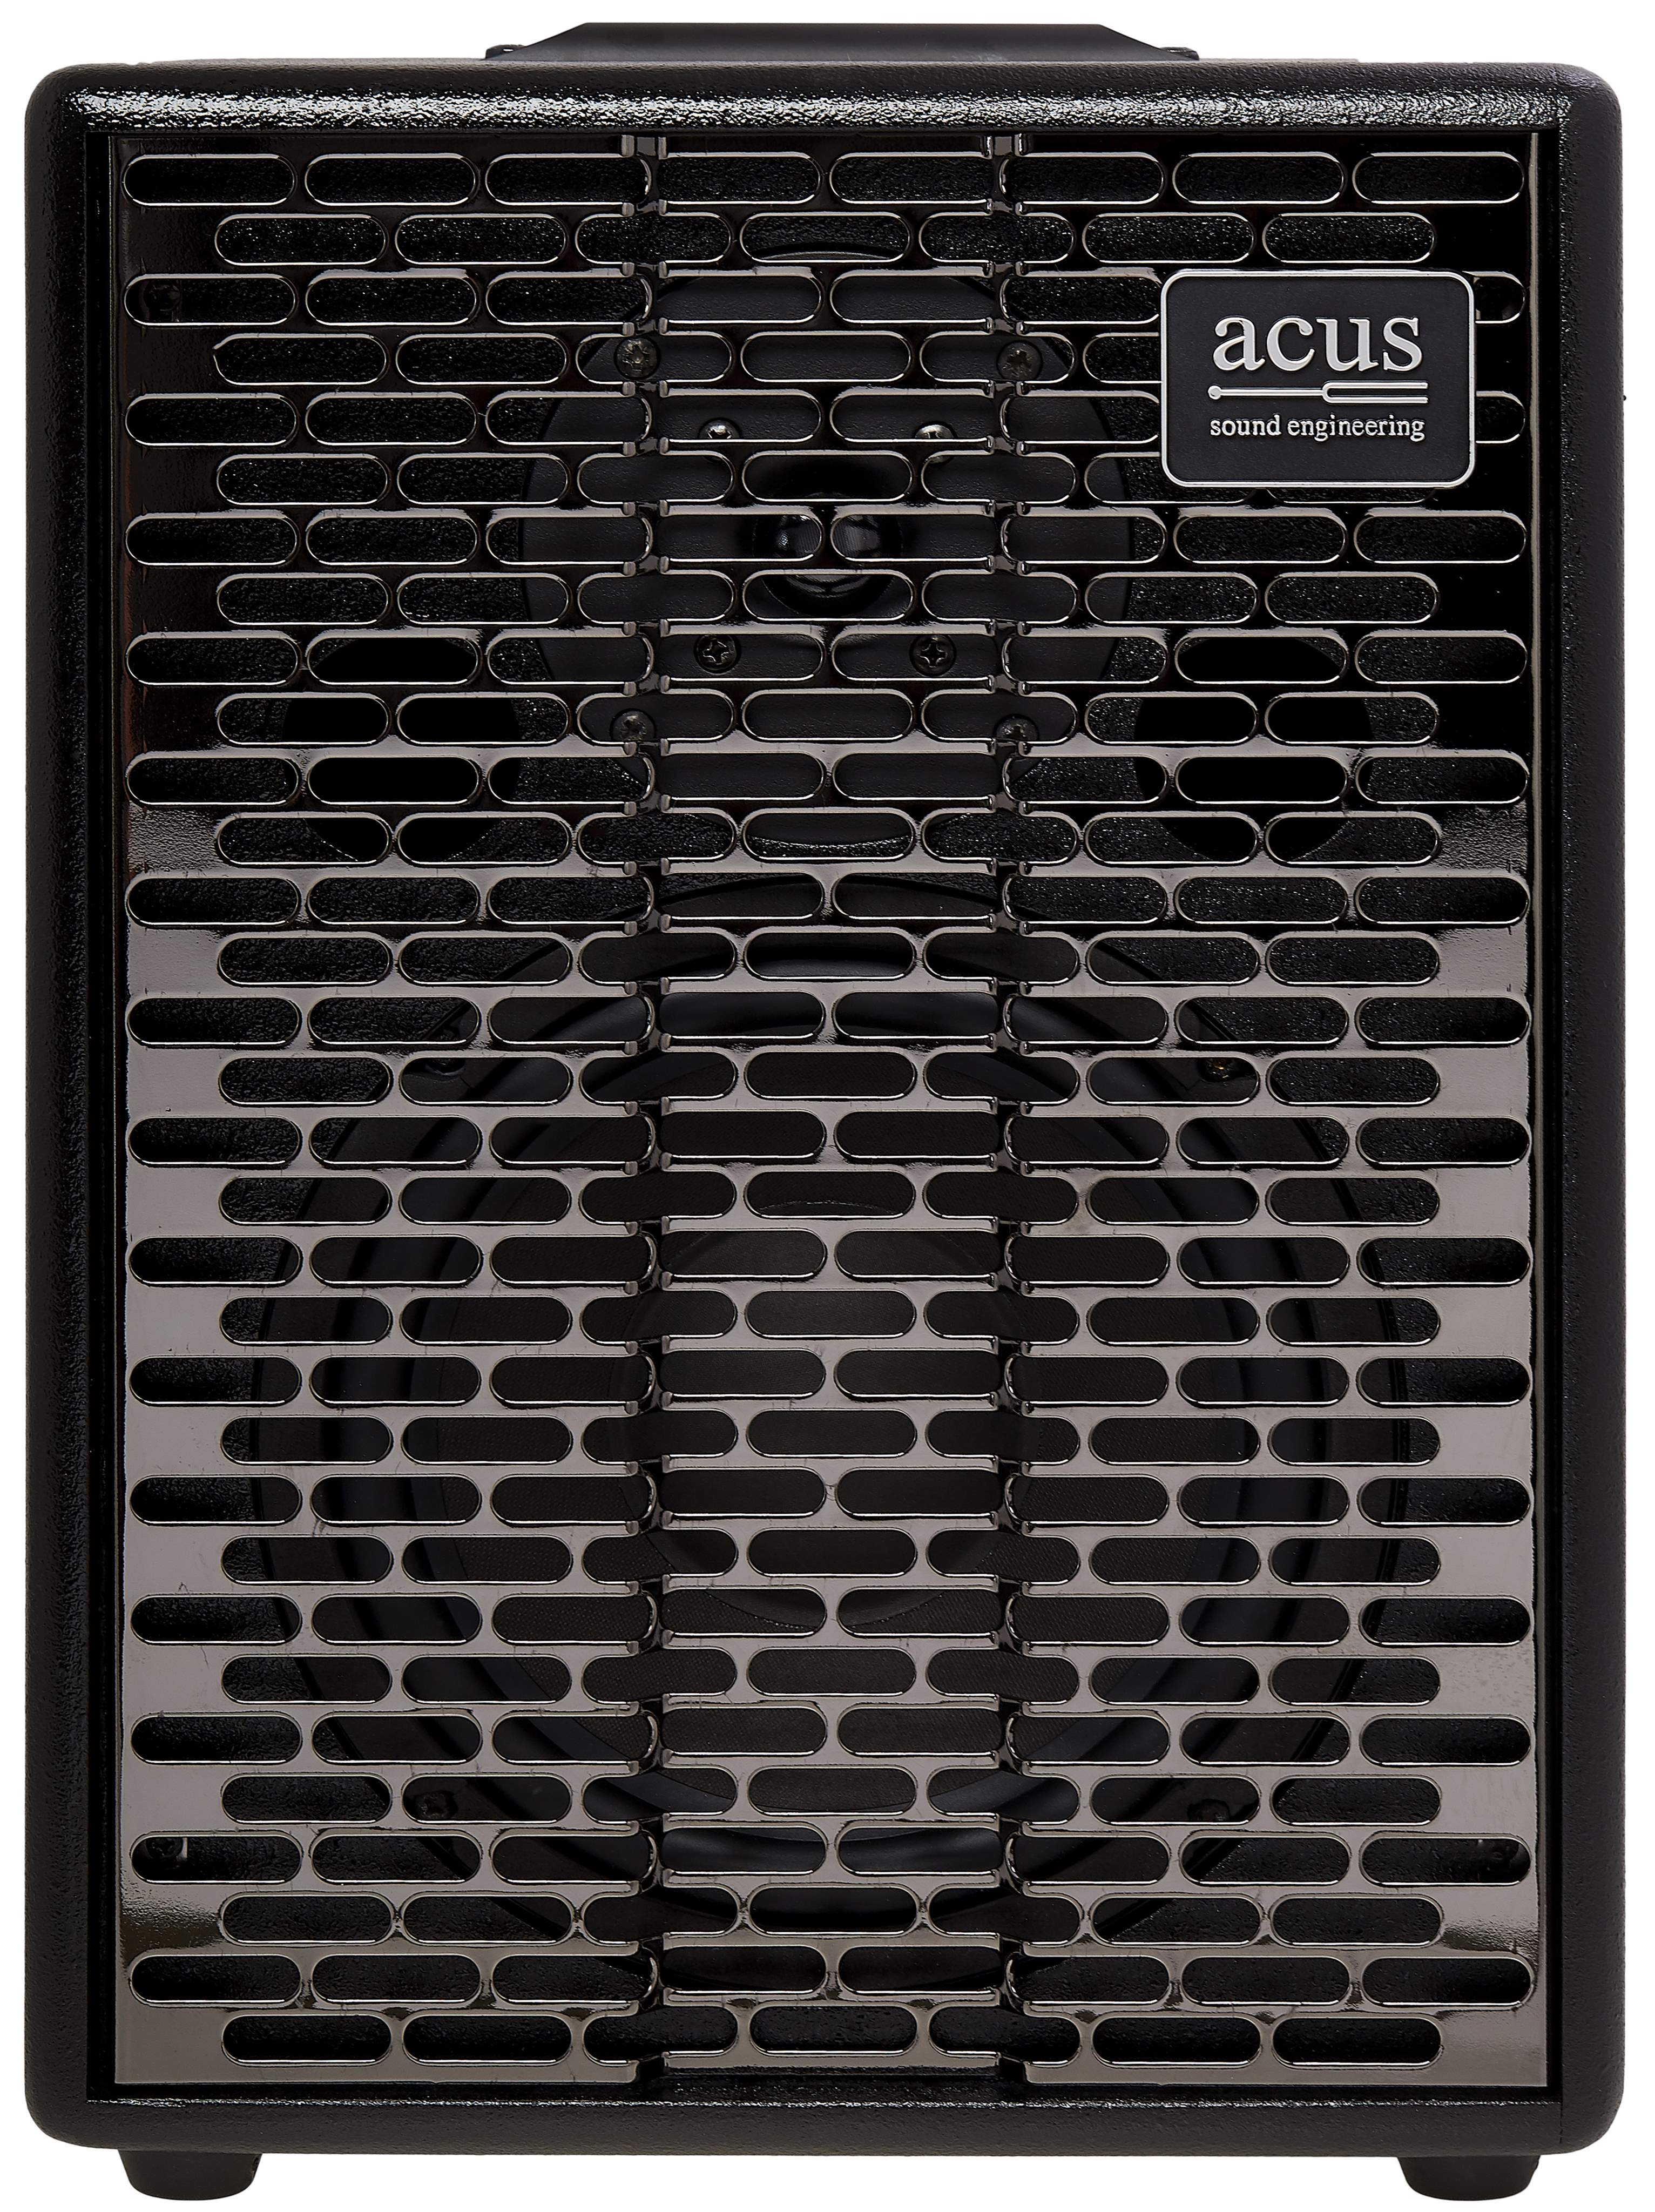 Acus One Forstrings 8 Simon Black 2.0